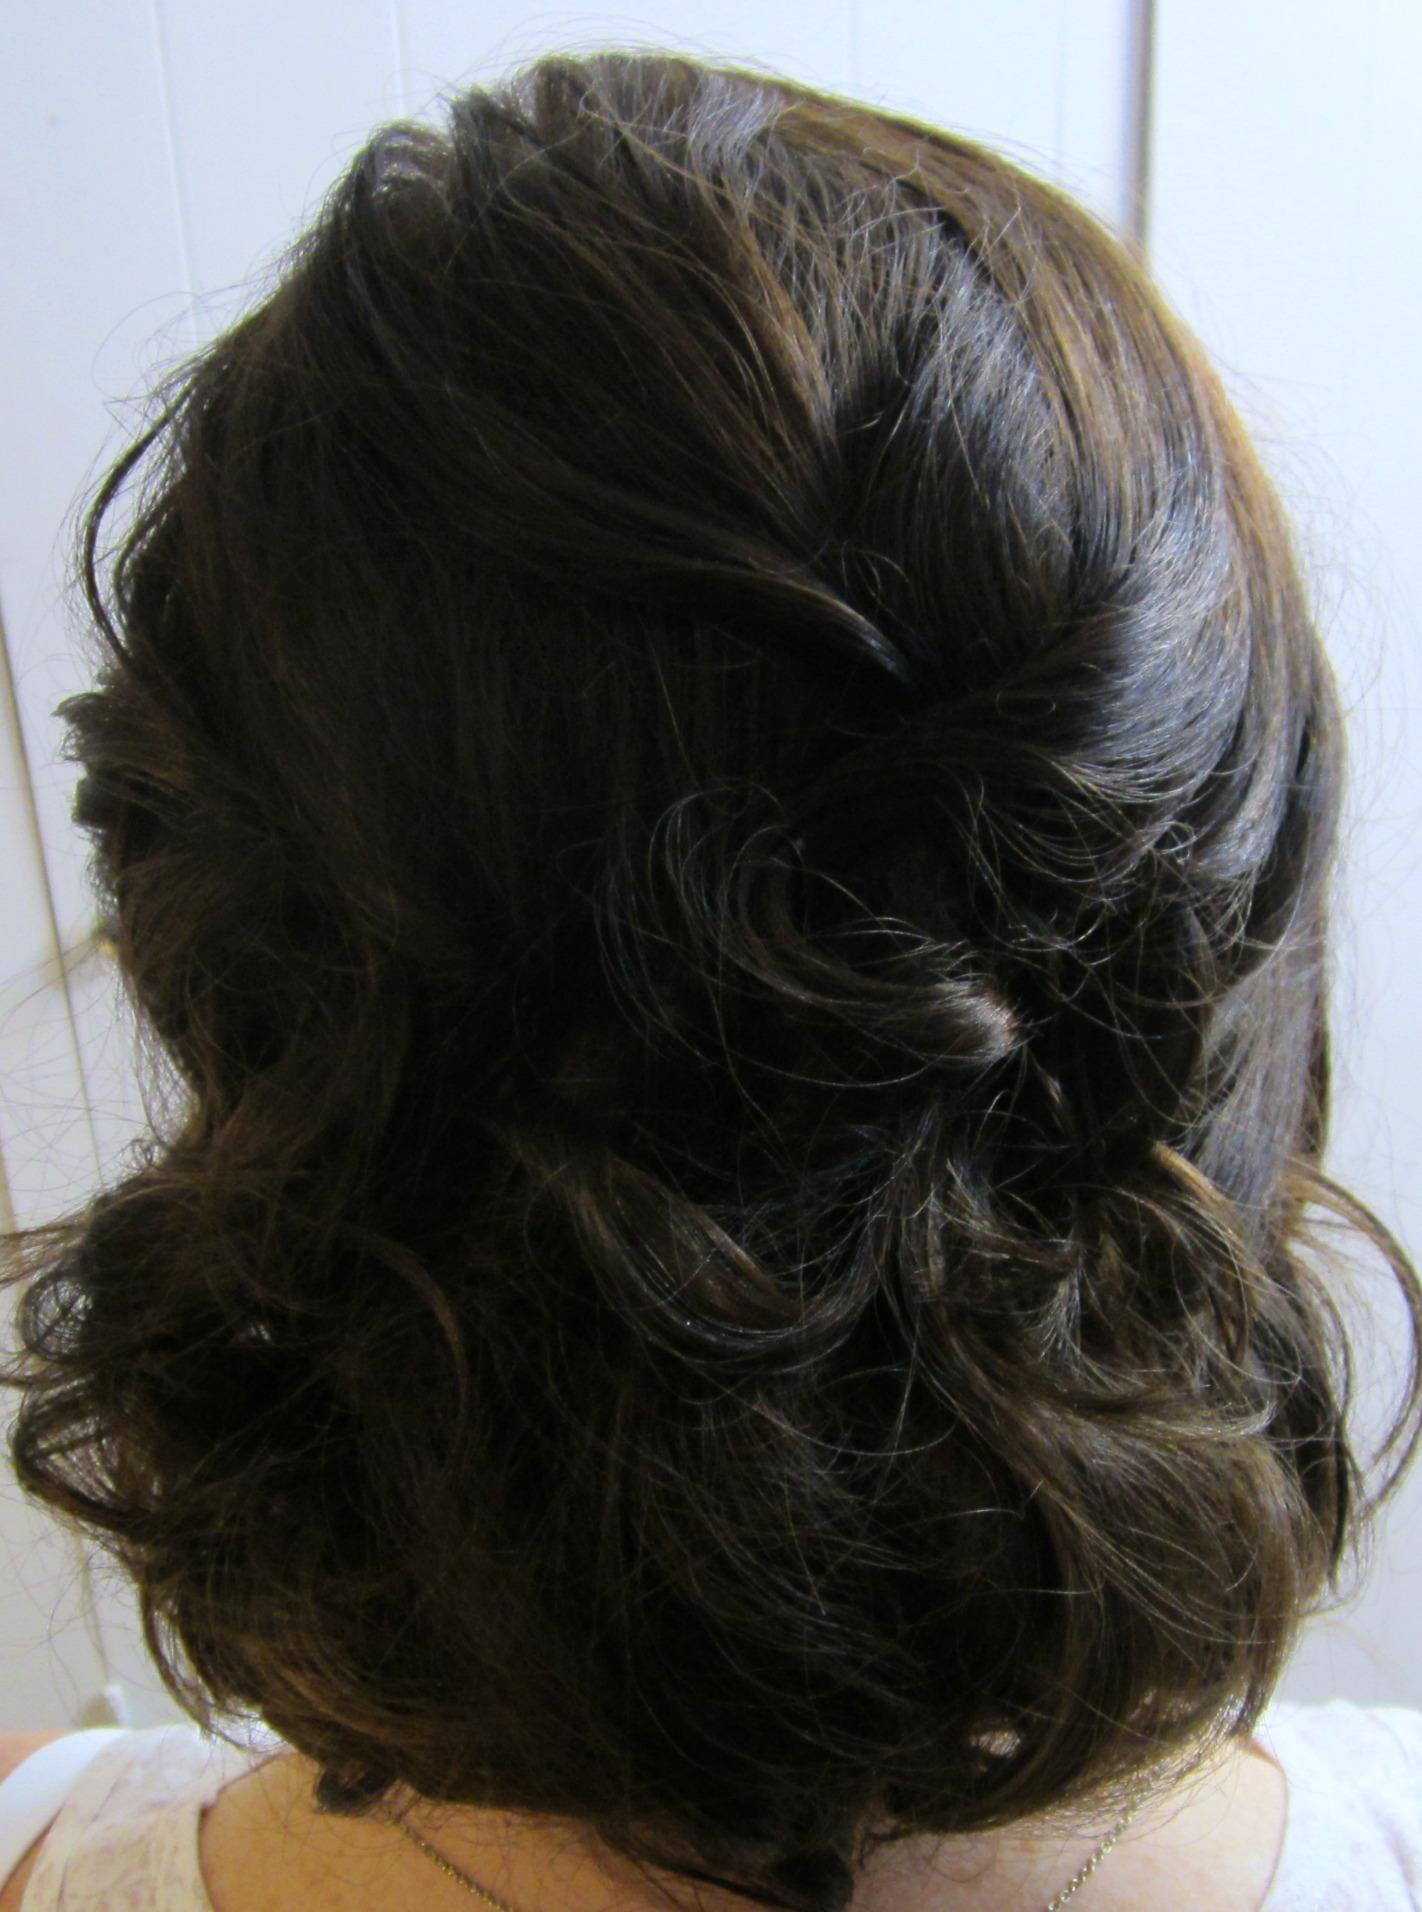 Bridal Hair & Makeup By Brides Etc.